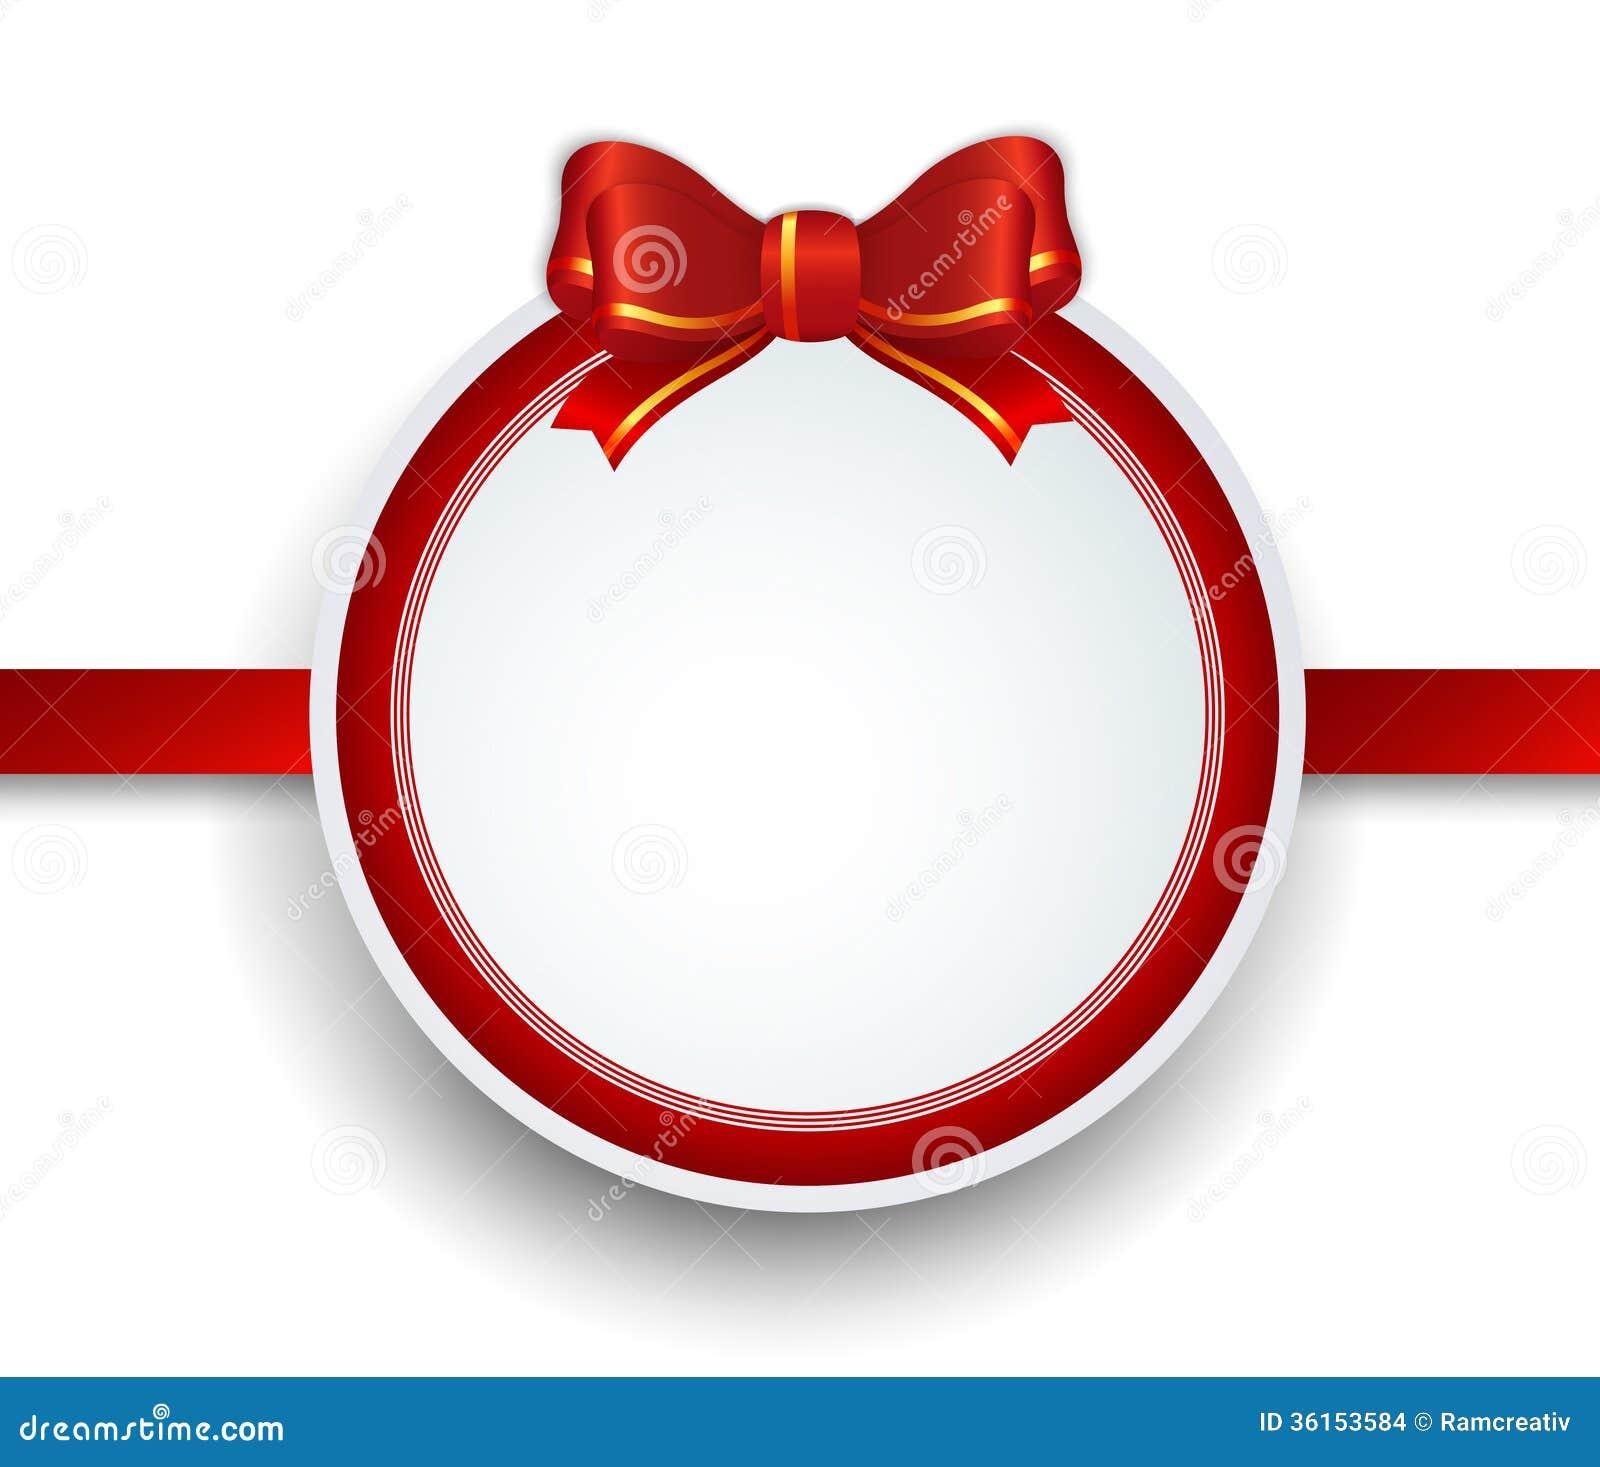 Nice Christmas Card Ornament Ball #2: Christmas-gift-frame-red-ribbon-bow-illustration-36153584.jpg